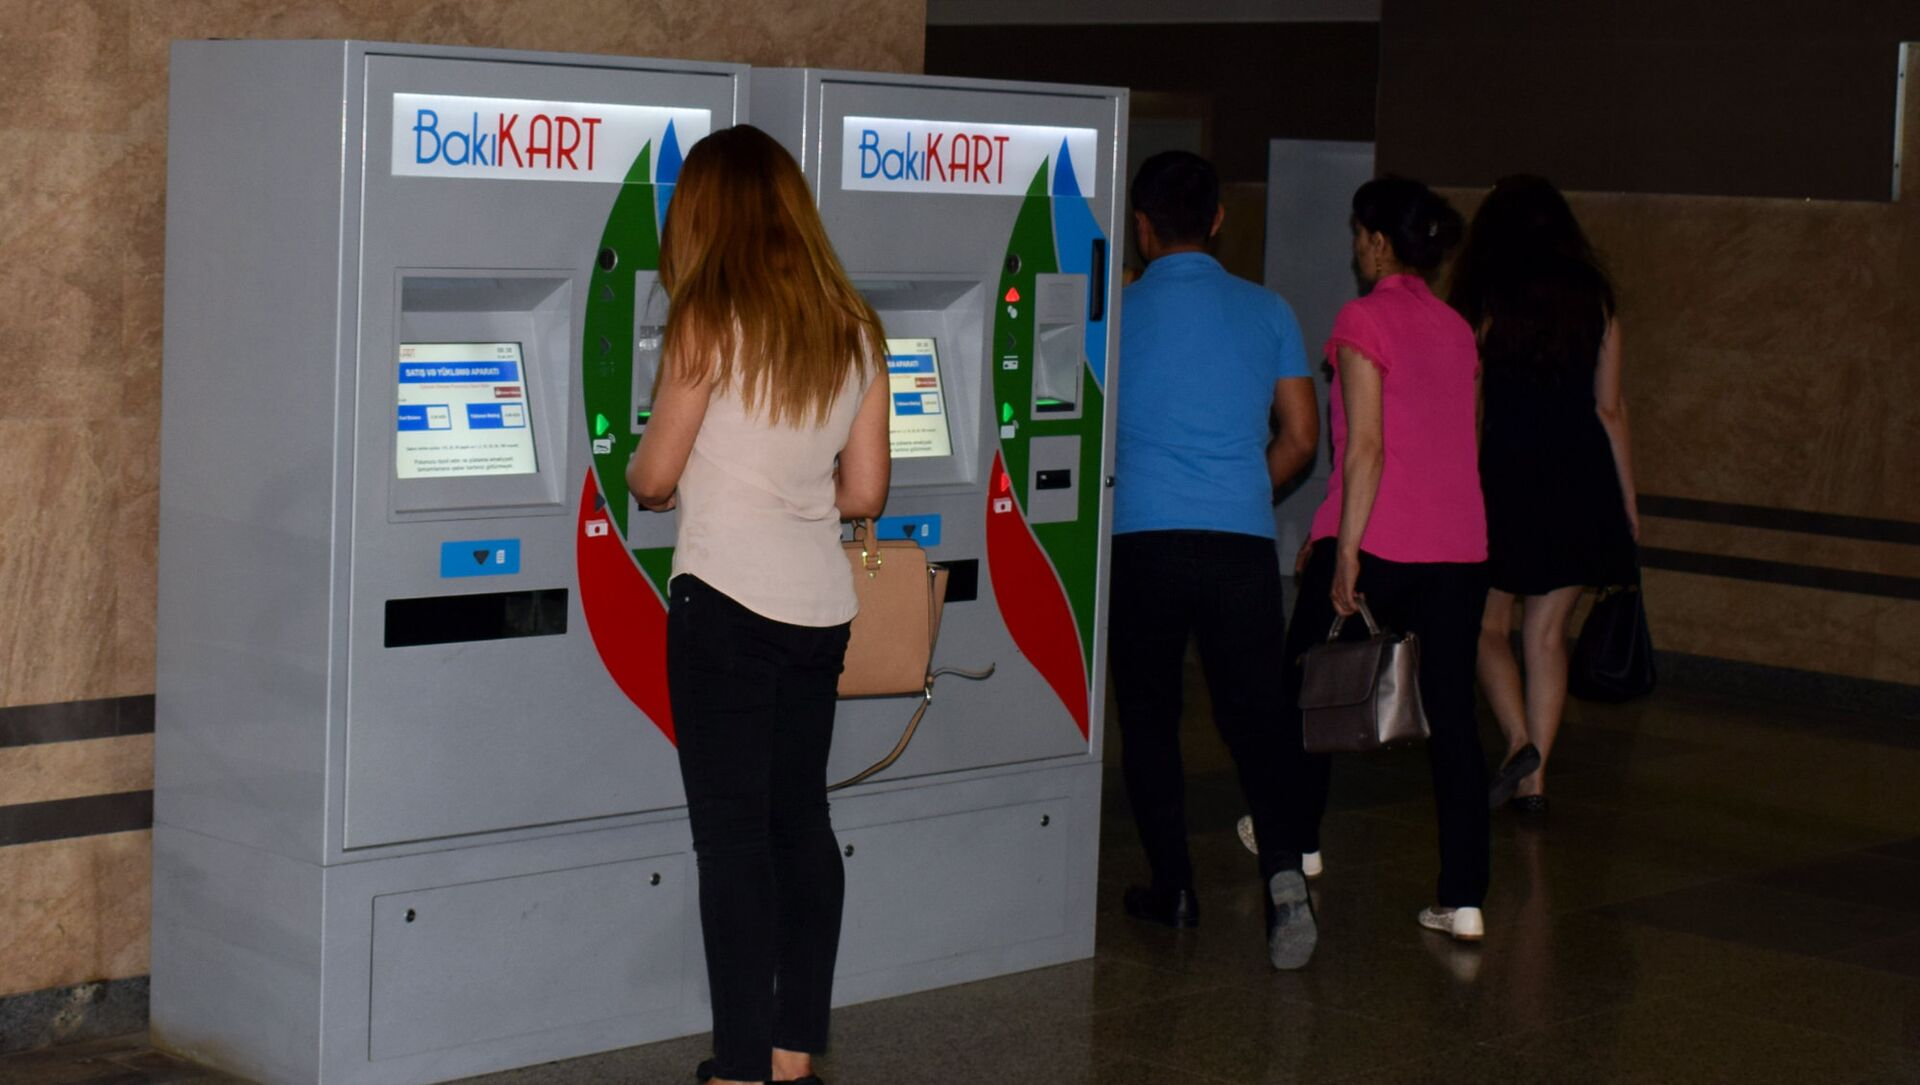 Девушка производит платеж через терминал оплаты на станции бакинского метрополитена  - Sputnik Azərbaycan, 1920, 24.09.2021